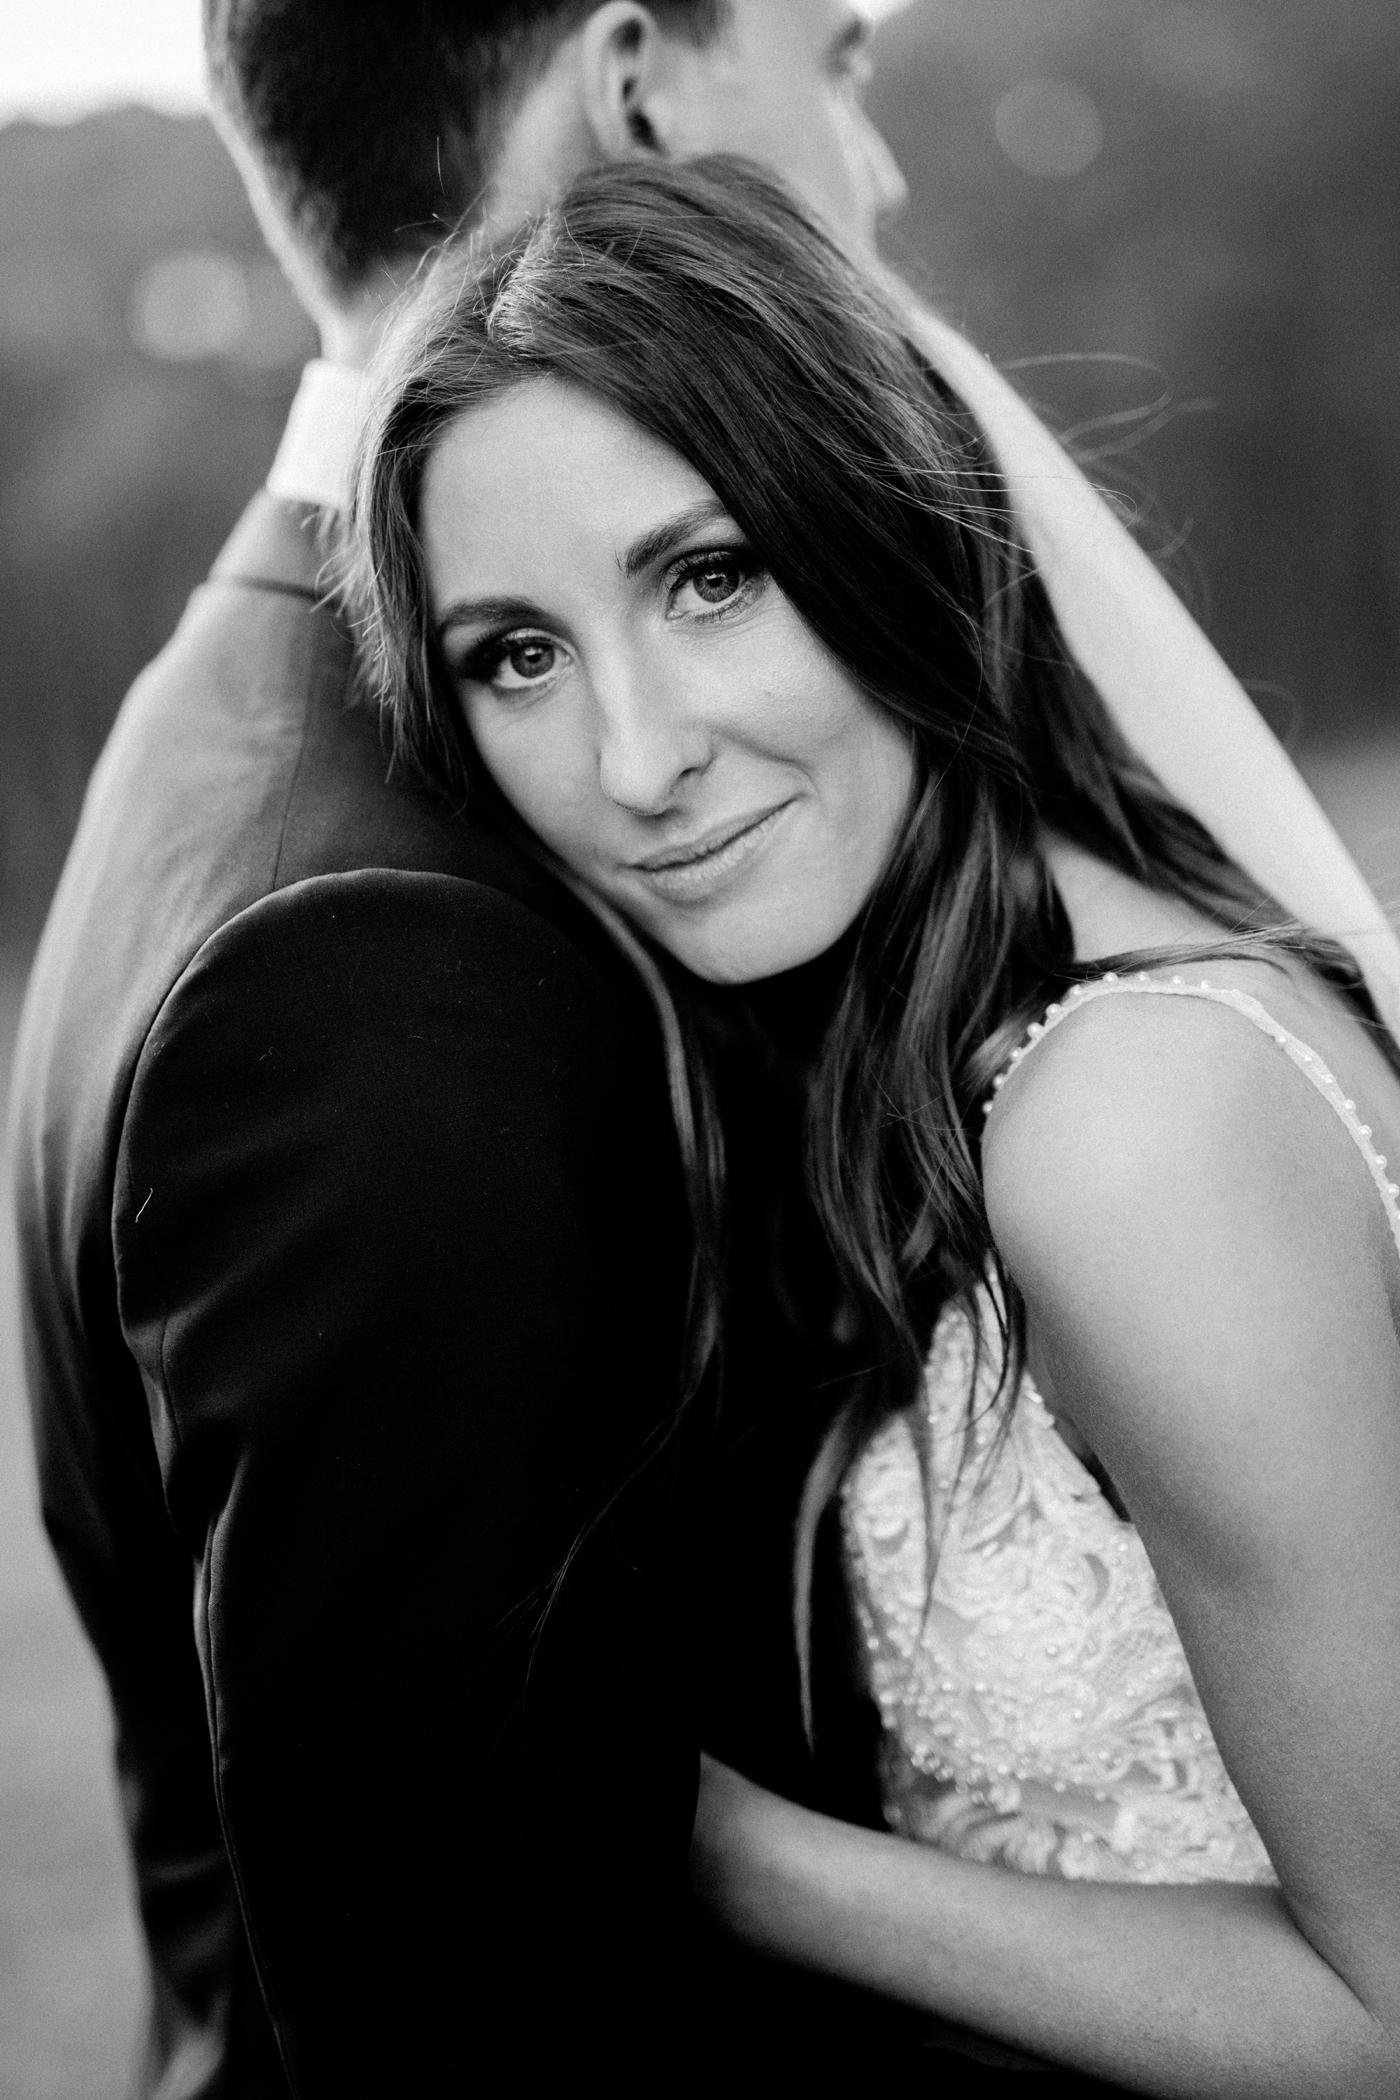 Katie and Ben - Natural Wedding Photography in Adelaide - Beautiful, Candid Wedding Photographer - Adelaide Hills Wedding - Katherine Schultz - www.katherineschultzphotography.com_0067.jpg